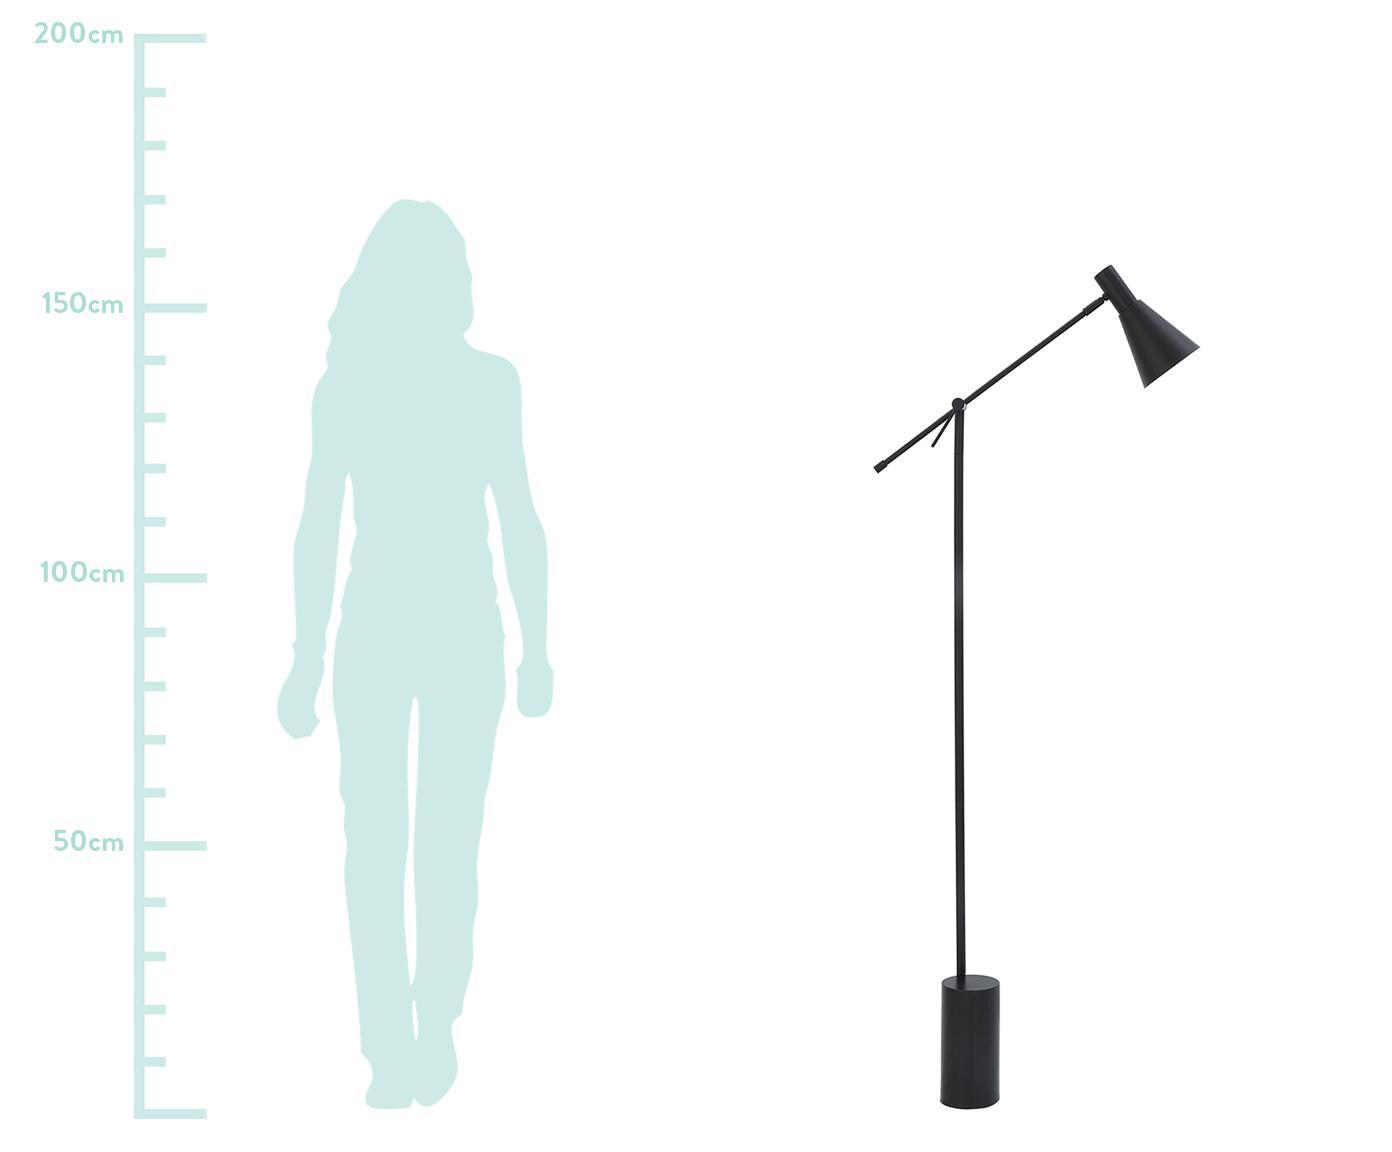 Vloerlamp Sia, Lampenkap: gepoedercoat metaal, Lampvoet: gepoedercoat metaal, Zwart, 14 x 162 cm